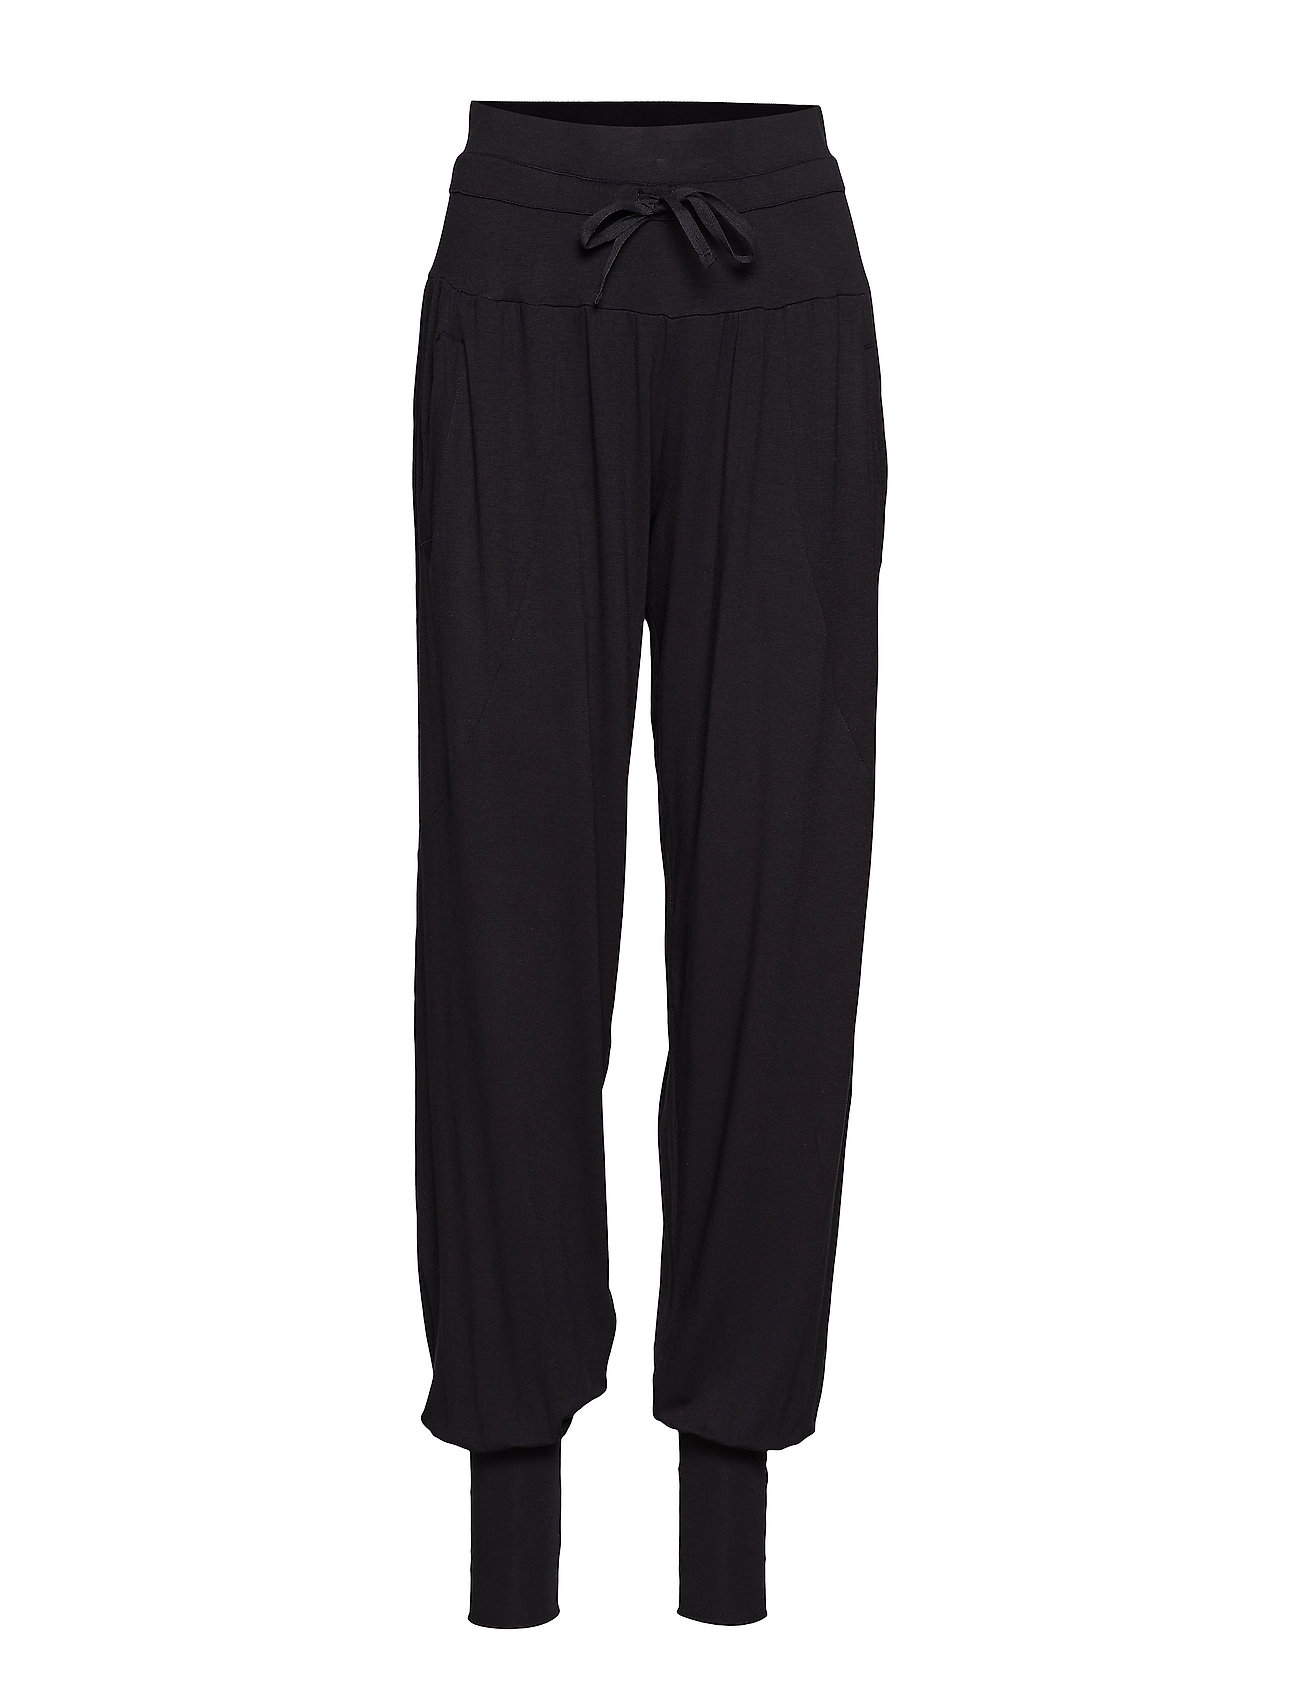 Moshi Moshi Mind pilou pants - BLACK